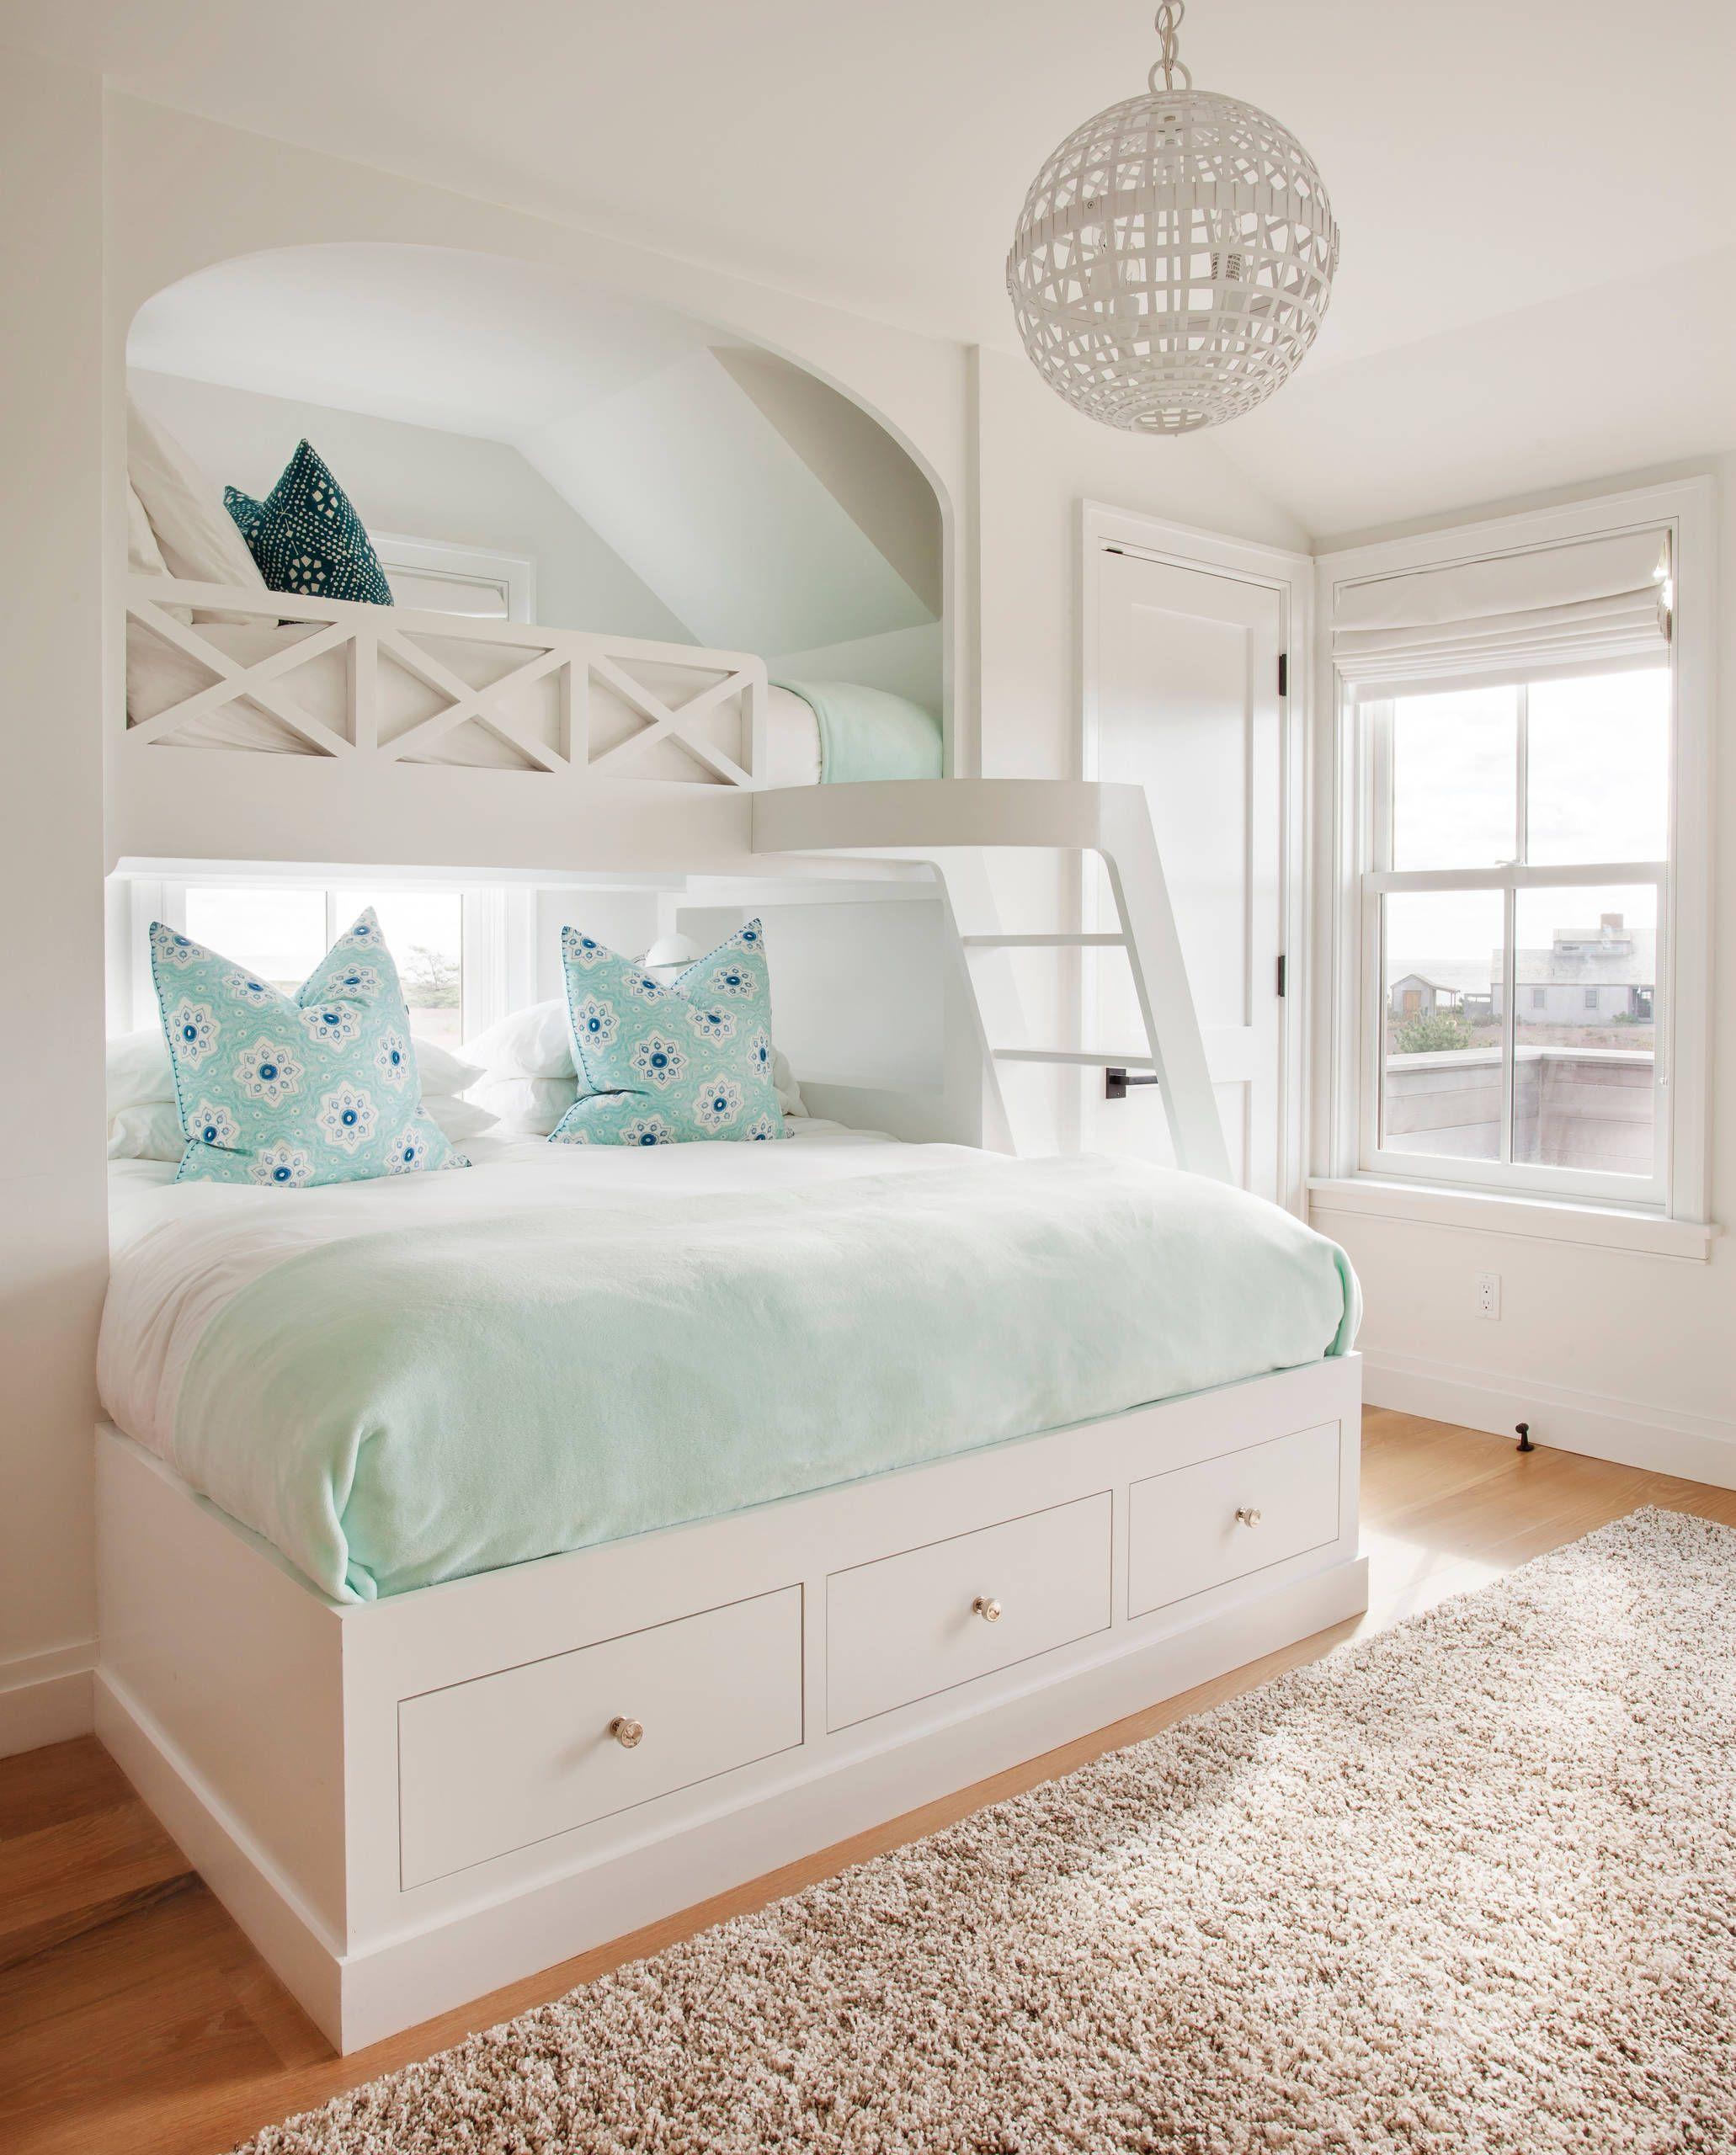 40 kid rooms that rock home homedesign homedesignideas homedecorideas homedecor decor decoration diy kitchen bathroom bathroomdesign livingroom